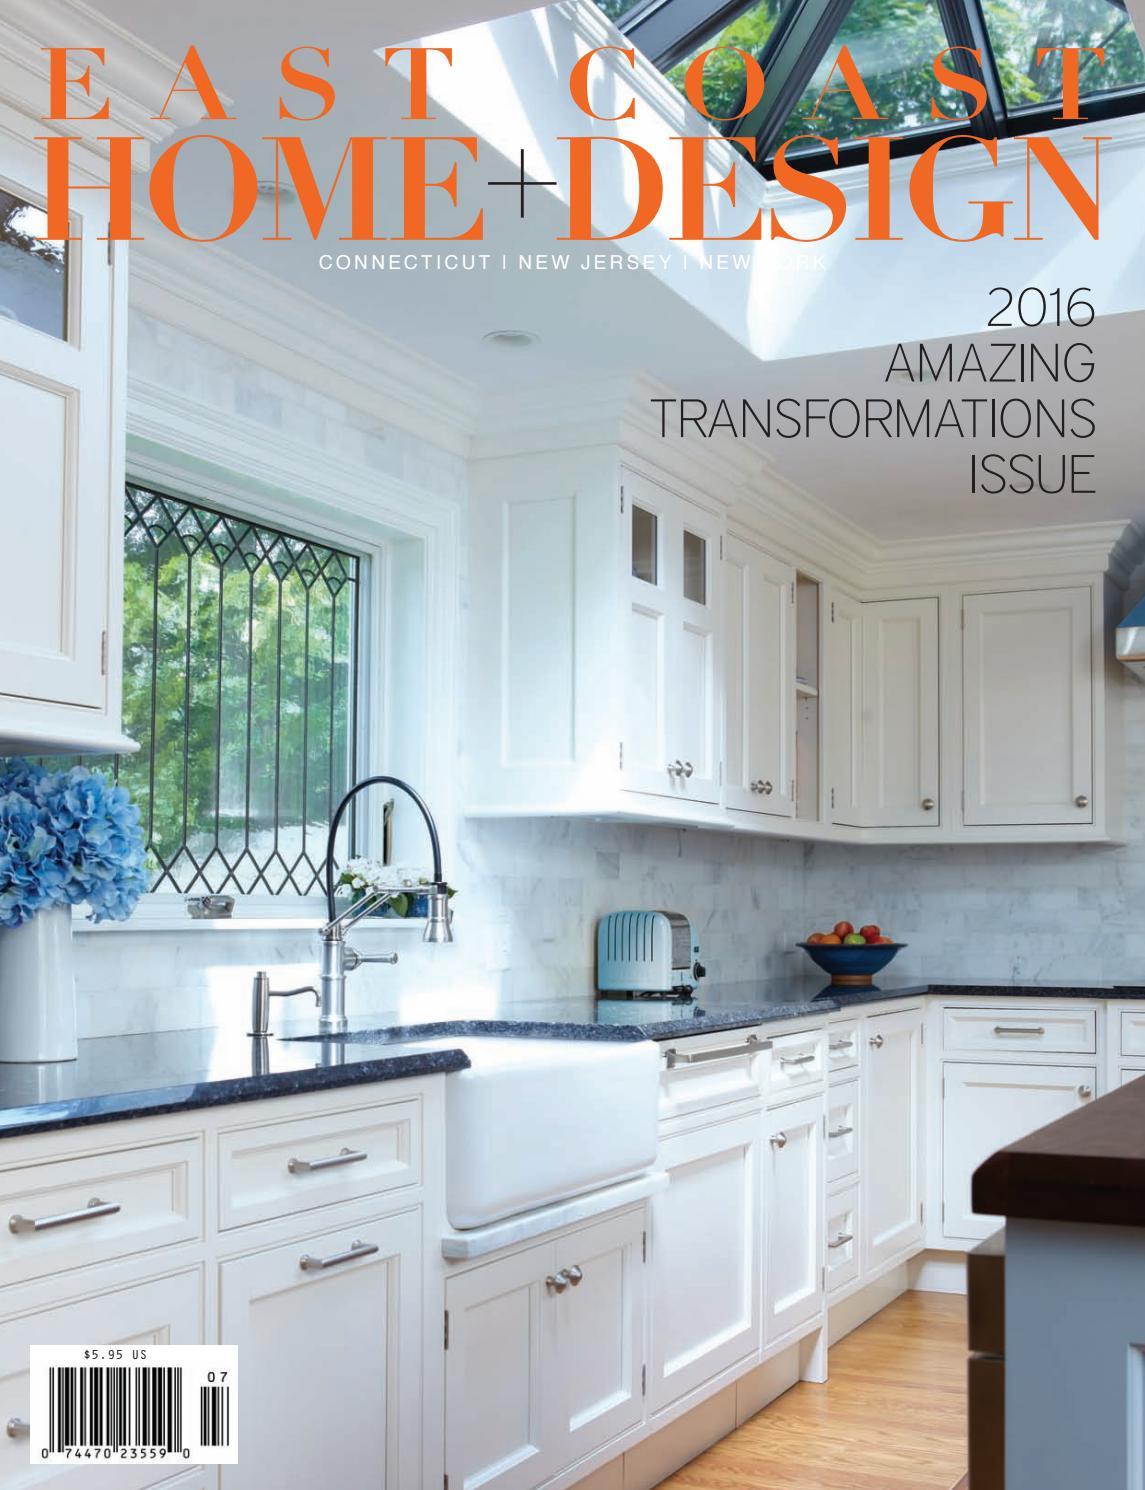 East Coast Home + Design By East Coast Home Publishing   Issuu